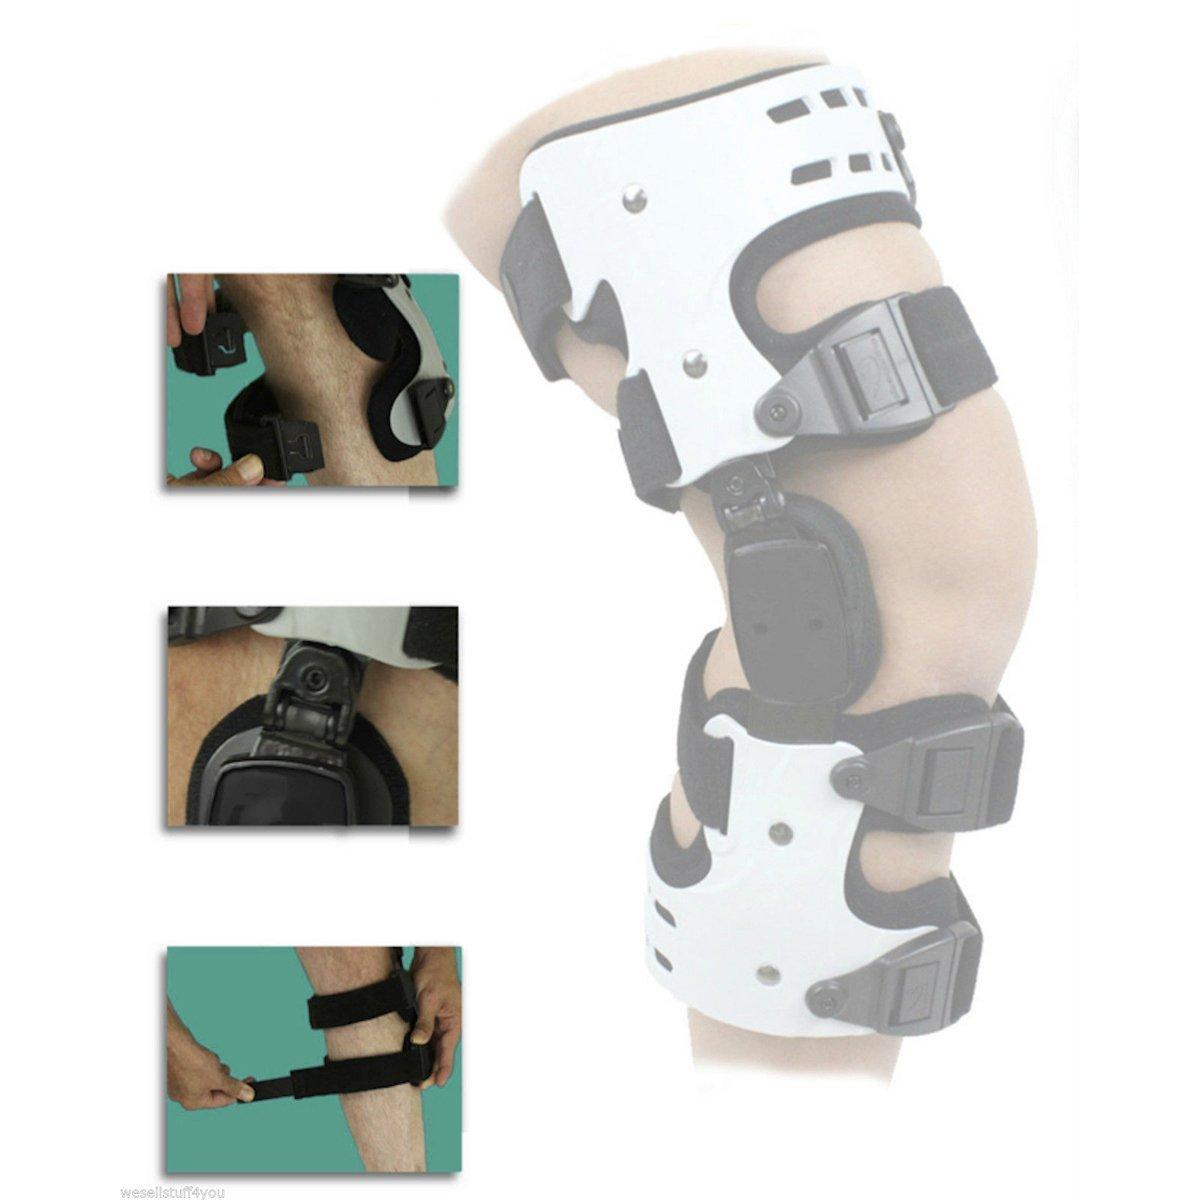 Orthomen OA Unloading Knee Brace for Osteoarthritis – Bone on Bone - Lateral Support - Size: Universal/Left by Orthomen (Image #5)